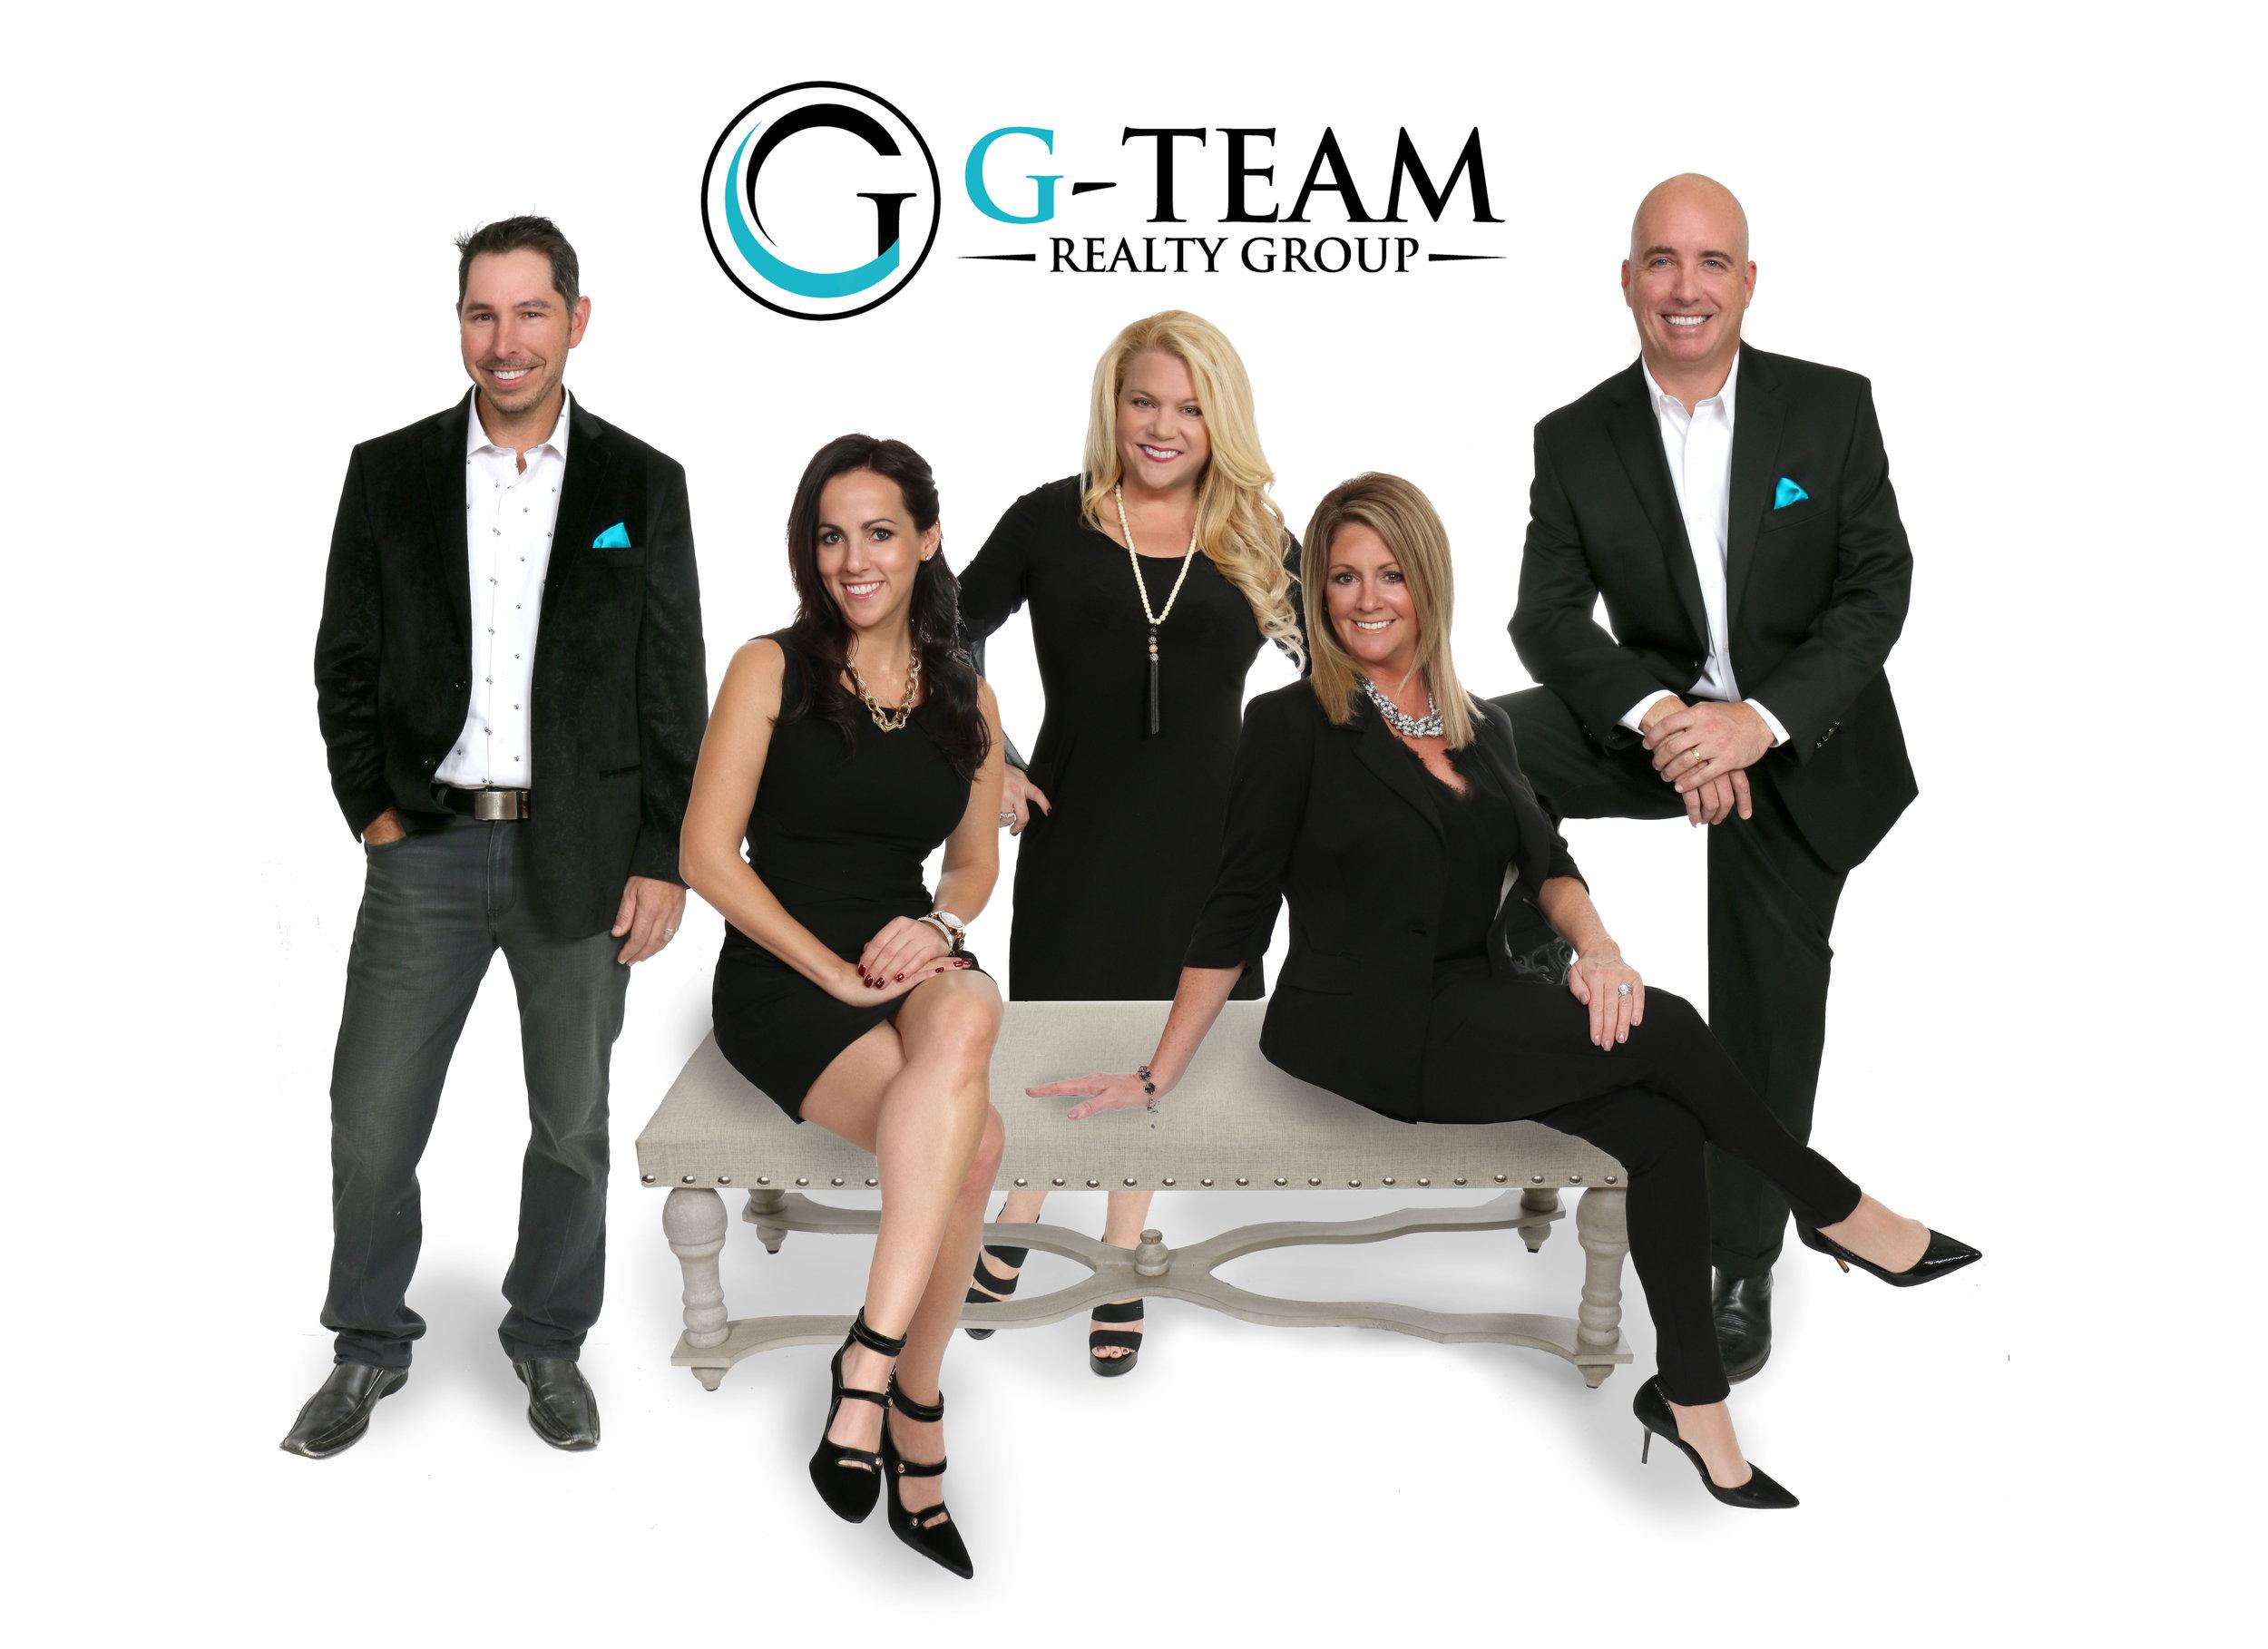 John G Team with logo .jpg